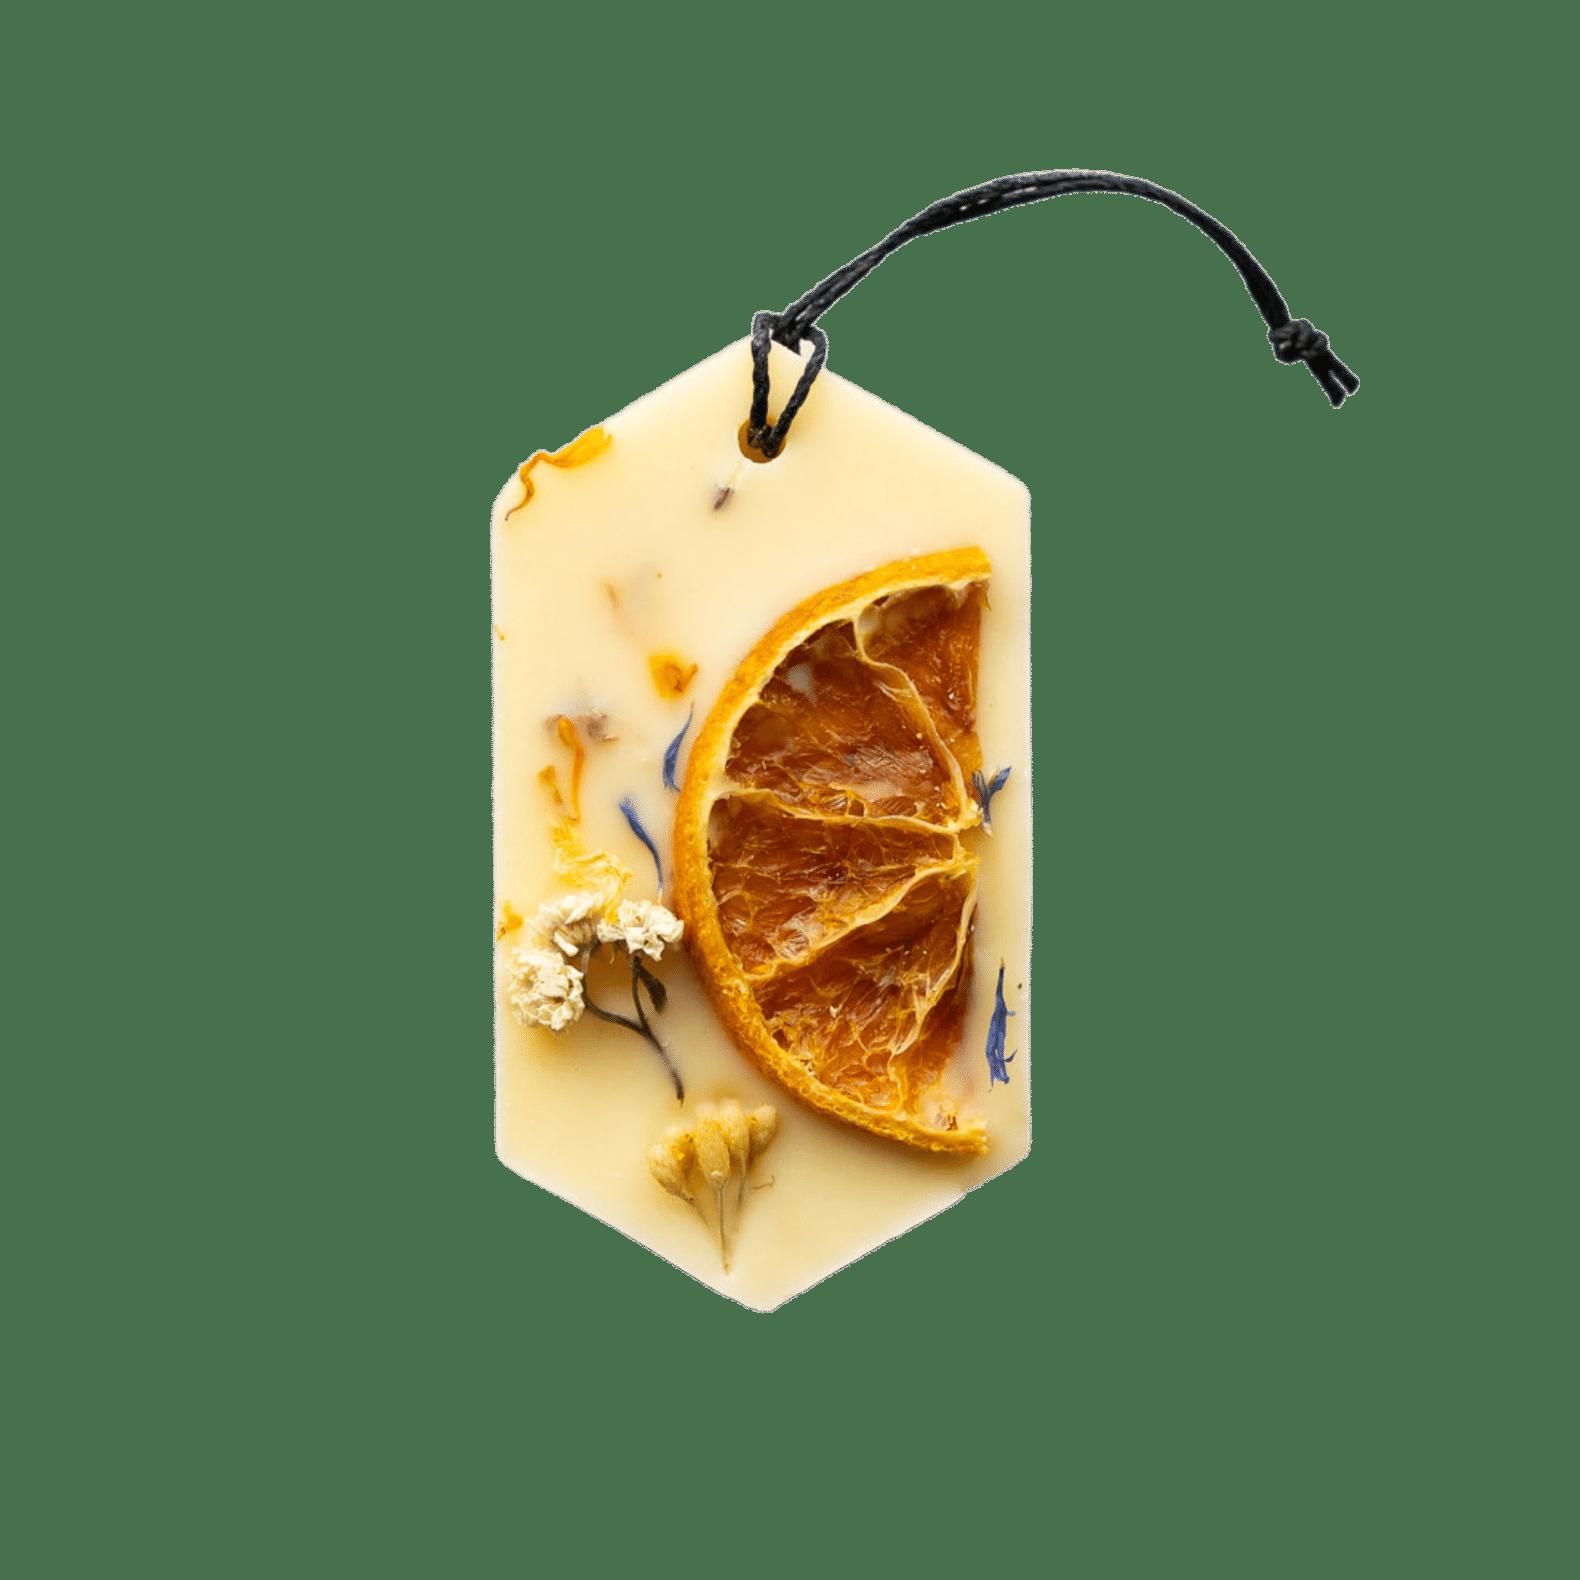 Mythyn - Botanical Scented Wax Tablets - Mikan - Mandarin Bergamot Patchouli